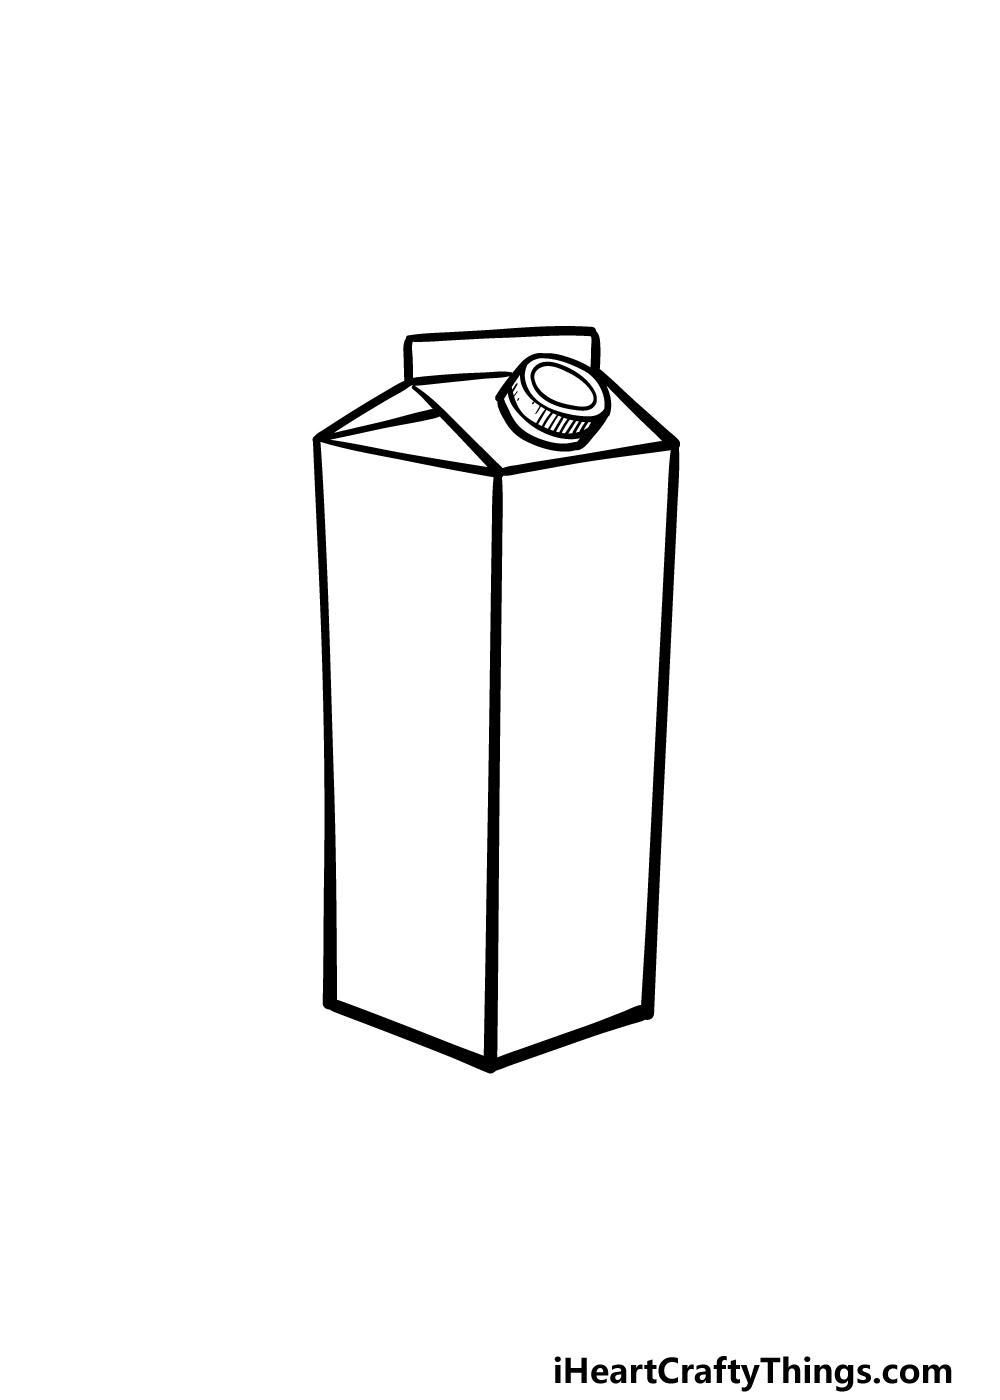 drawing a milk carton step 4